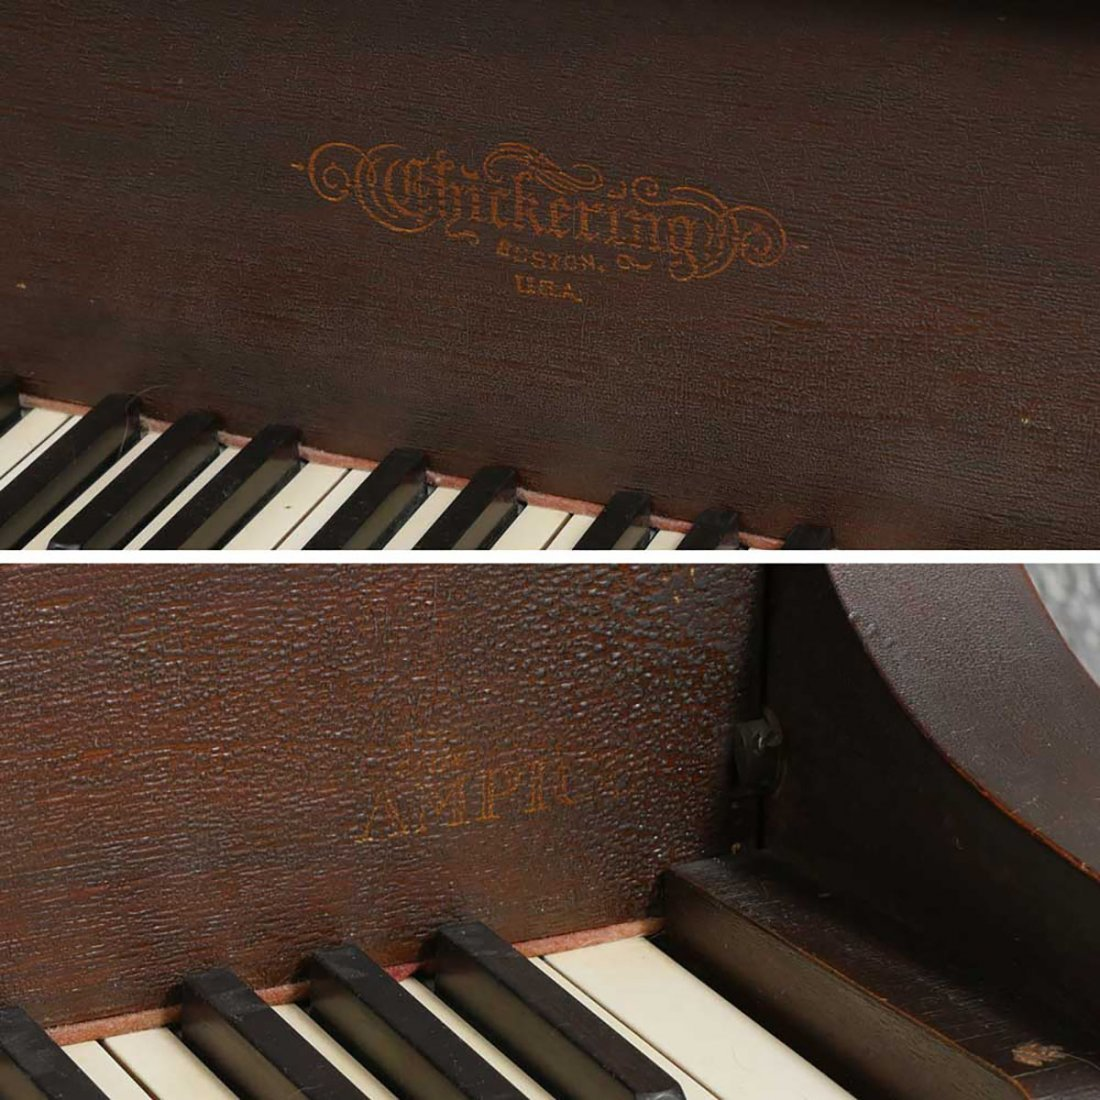 CHICKERING & SONS, BOSTON BABY GRAND PLAYER PIANO - 10